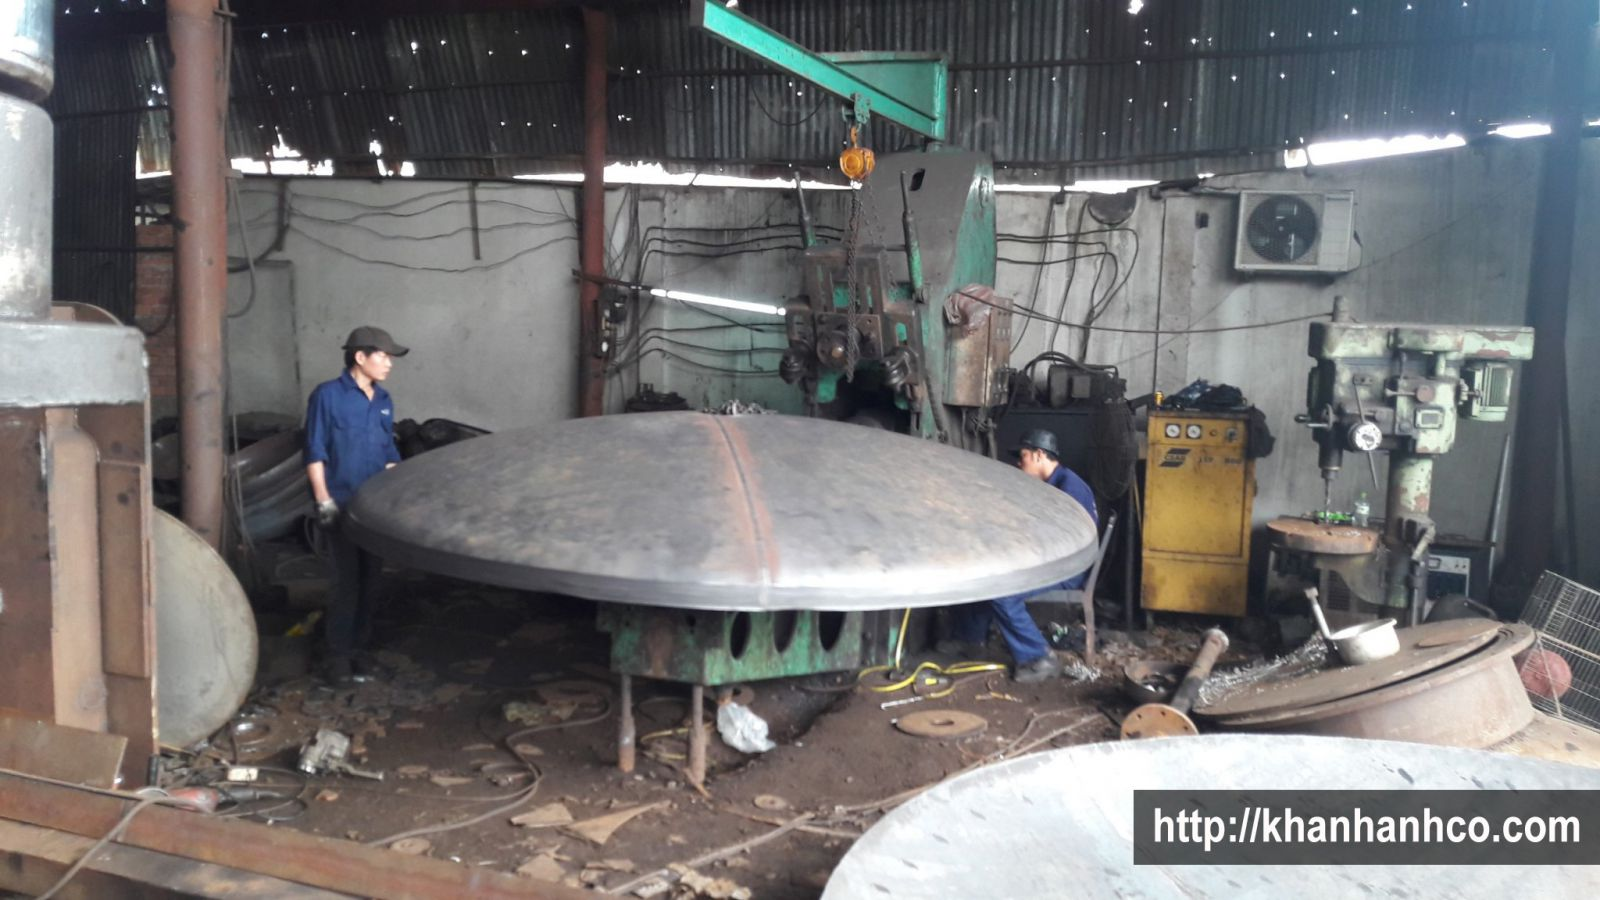 https://khanhanhco.com/co-khi/gia-cong-co-khi-theo-yeu-cau-tai-tphcm-81.html